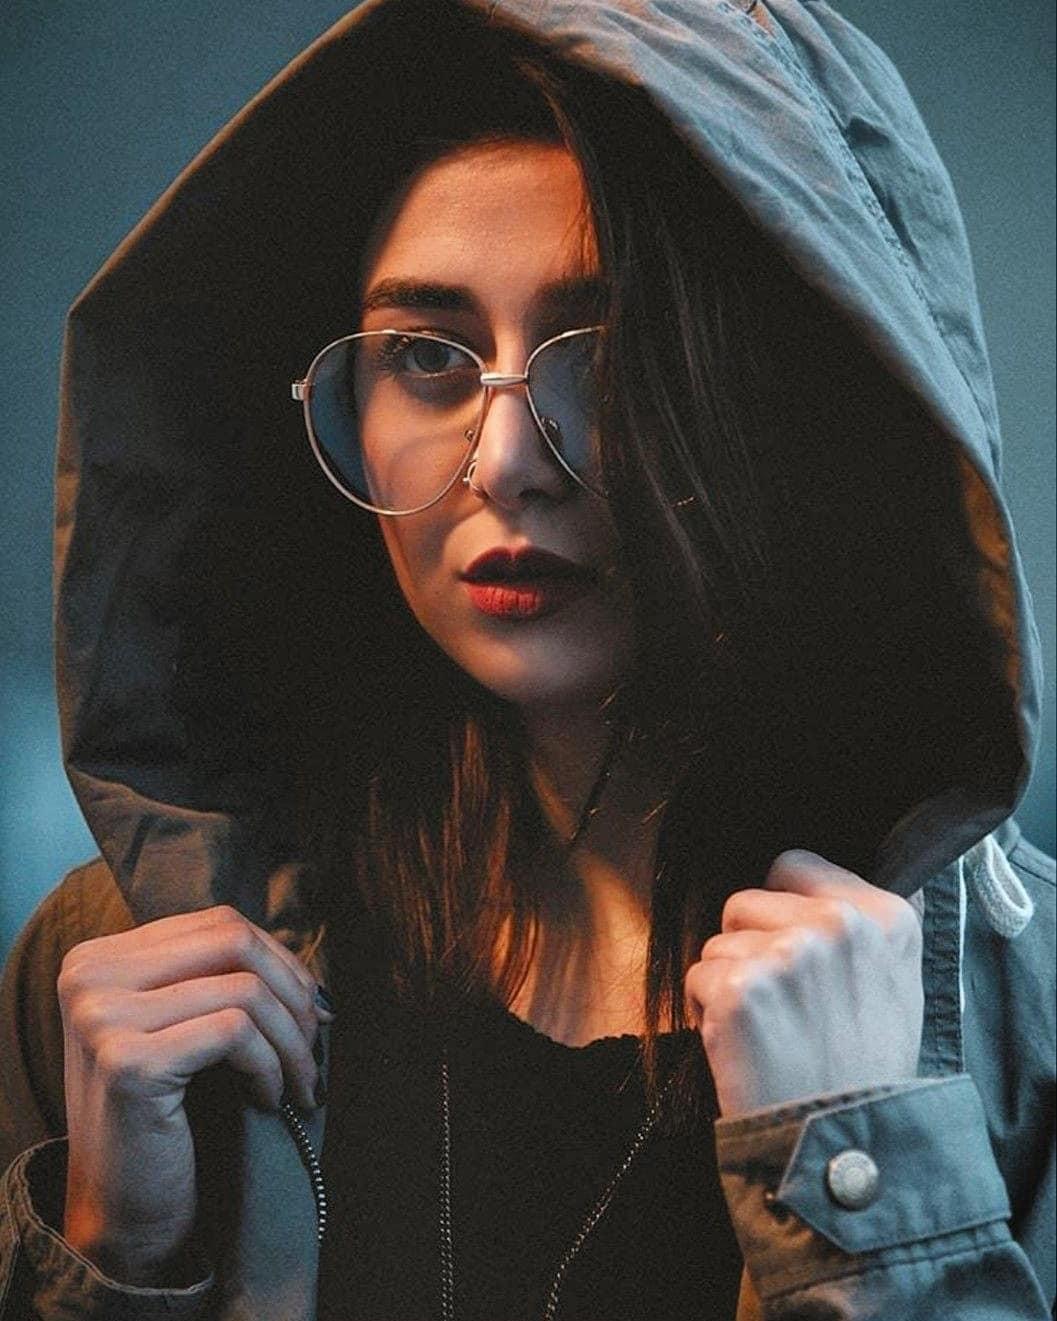 World Stylish Girl DP for Facebook Profile 2020